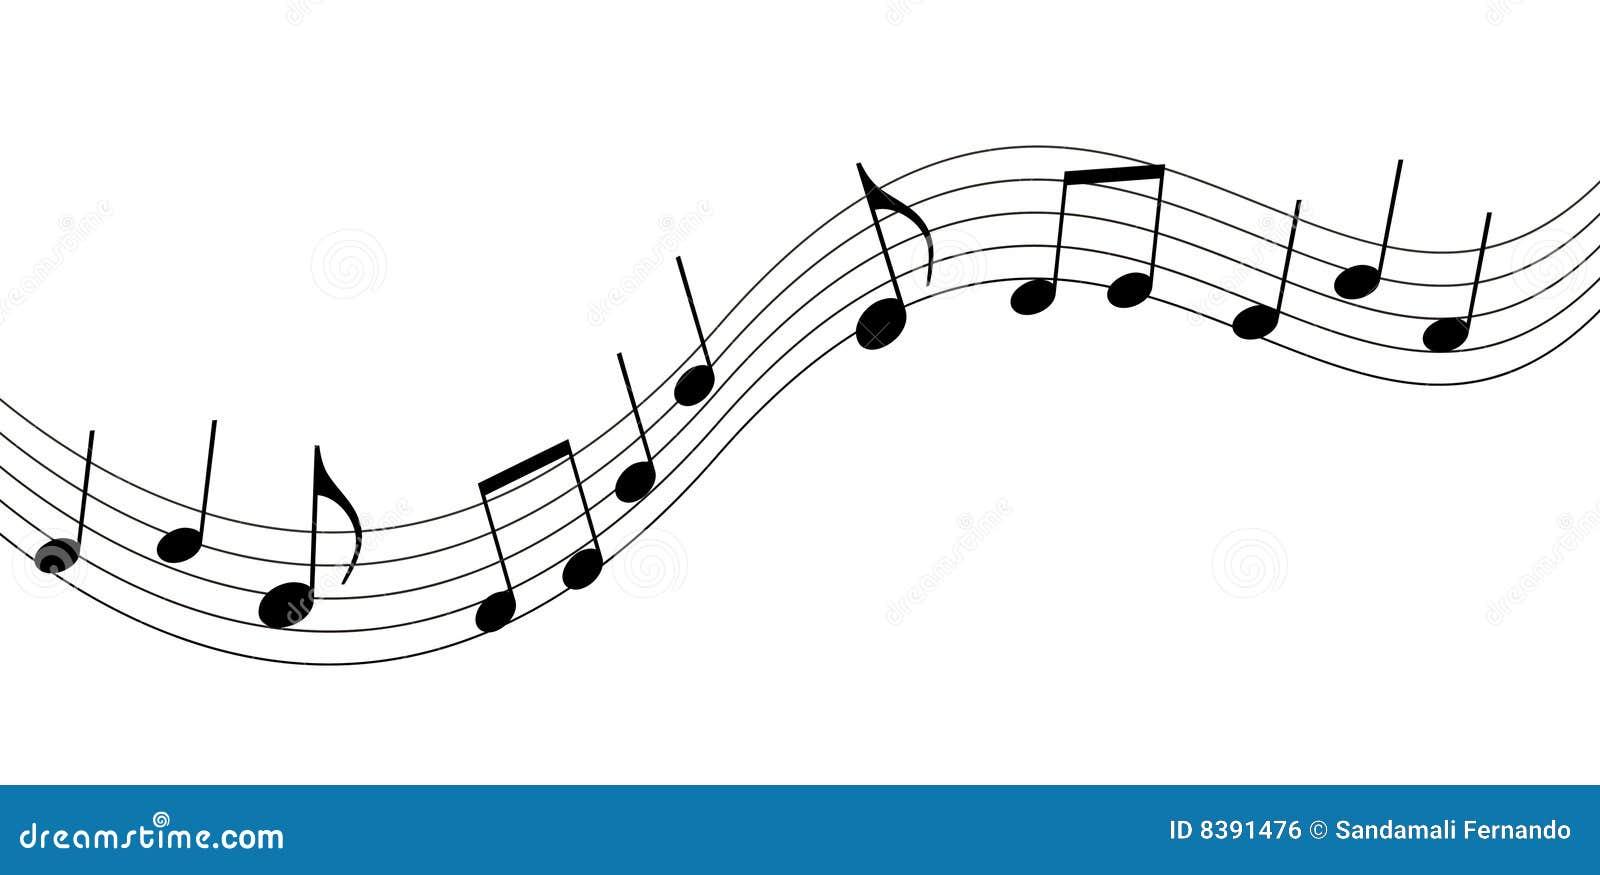 Music Notes Royalty Free Stock Image - Image: 8391476